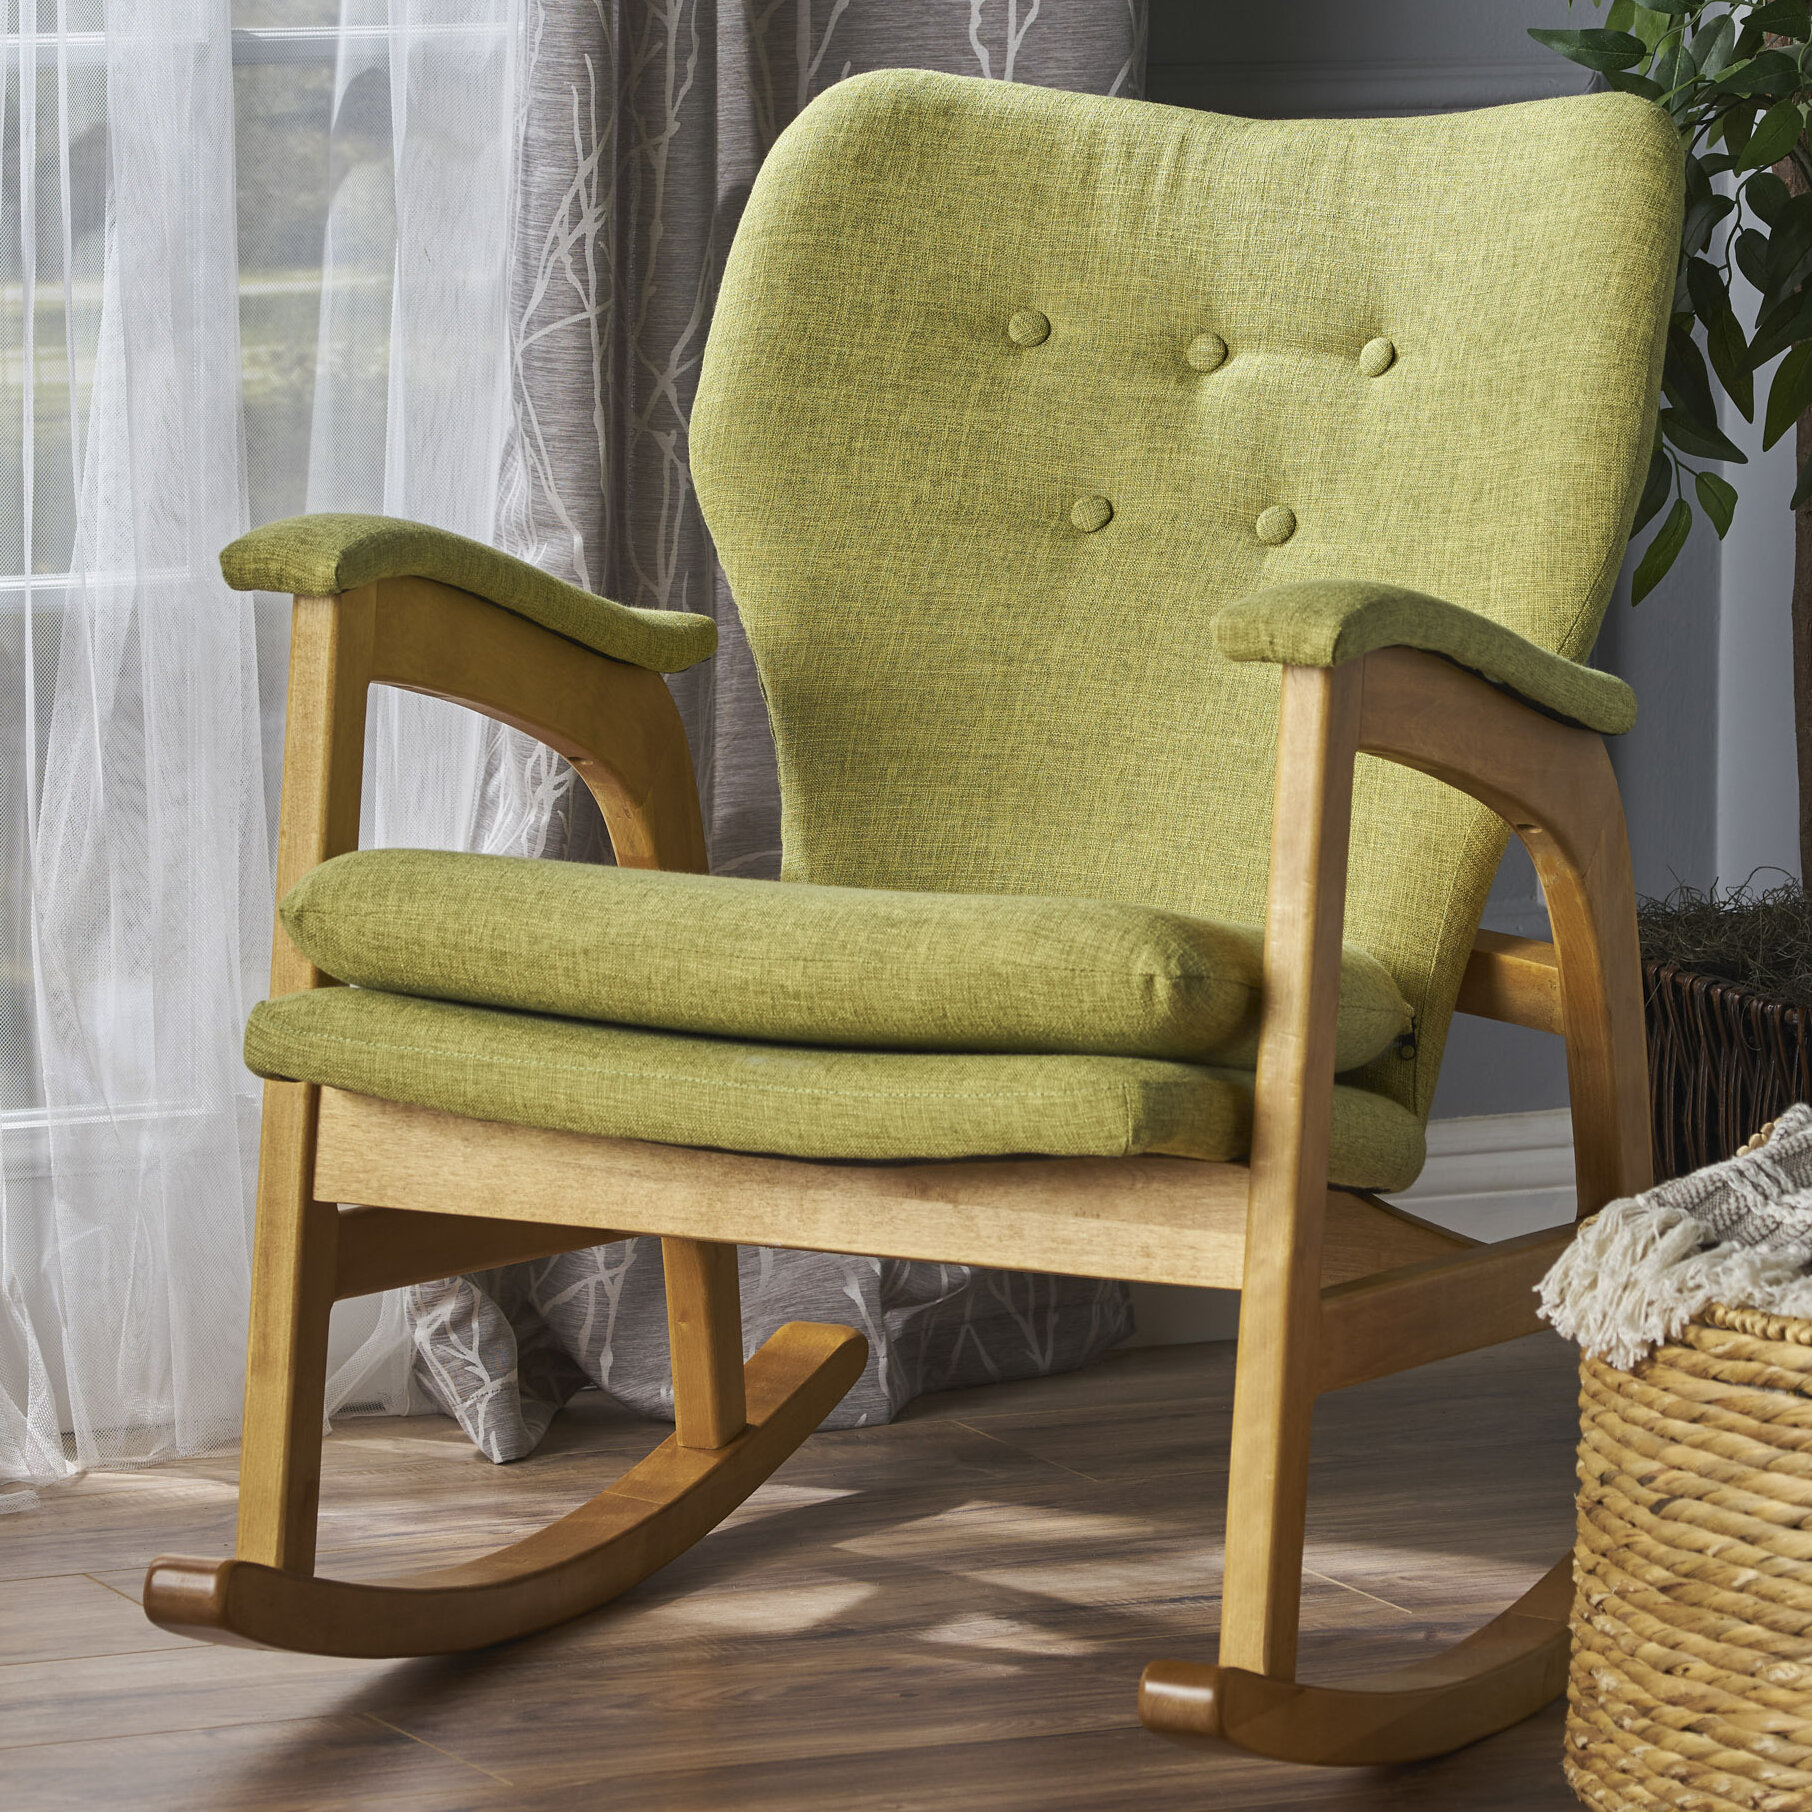 Brayden Studio Saulsberry Fabric Rocking Chair U0026 Reviews   Wayfair